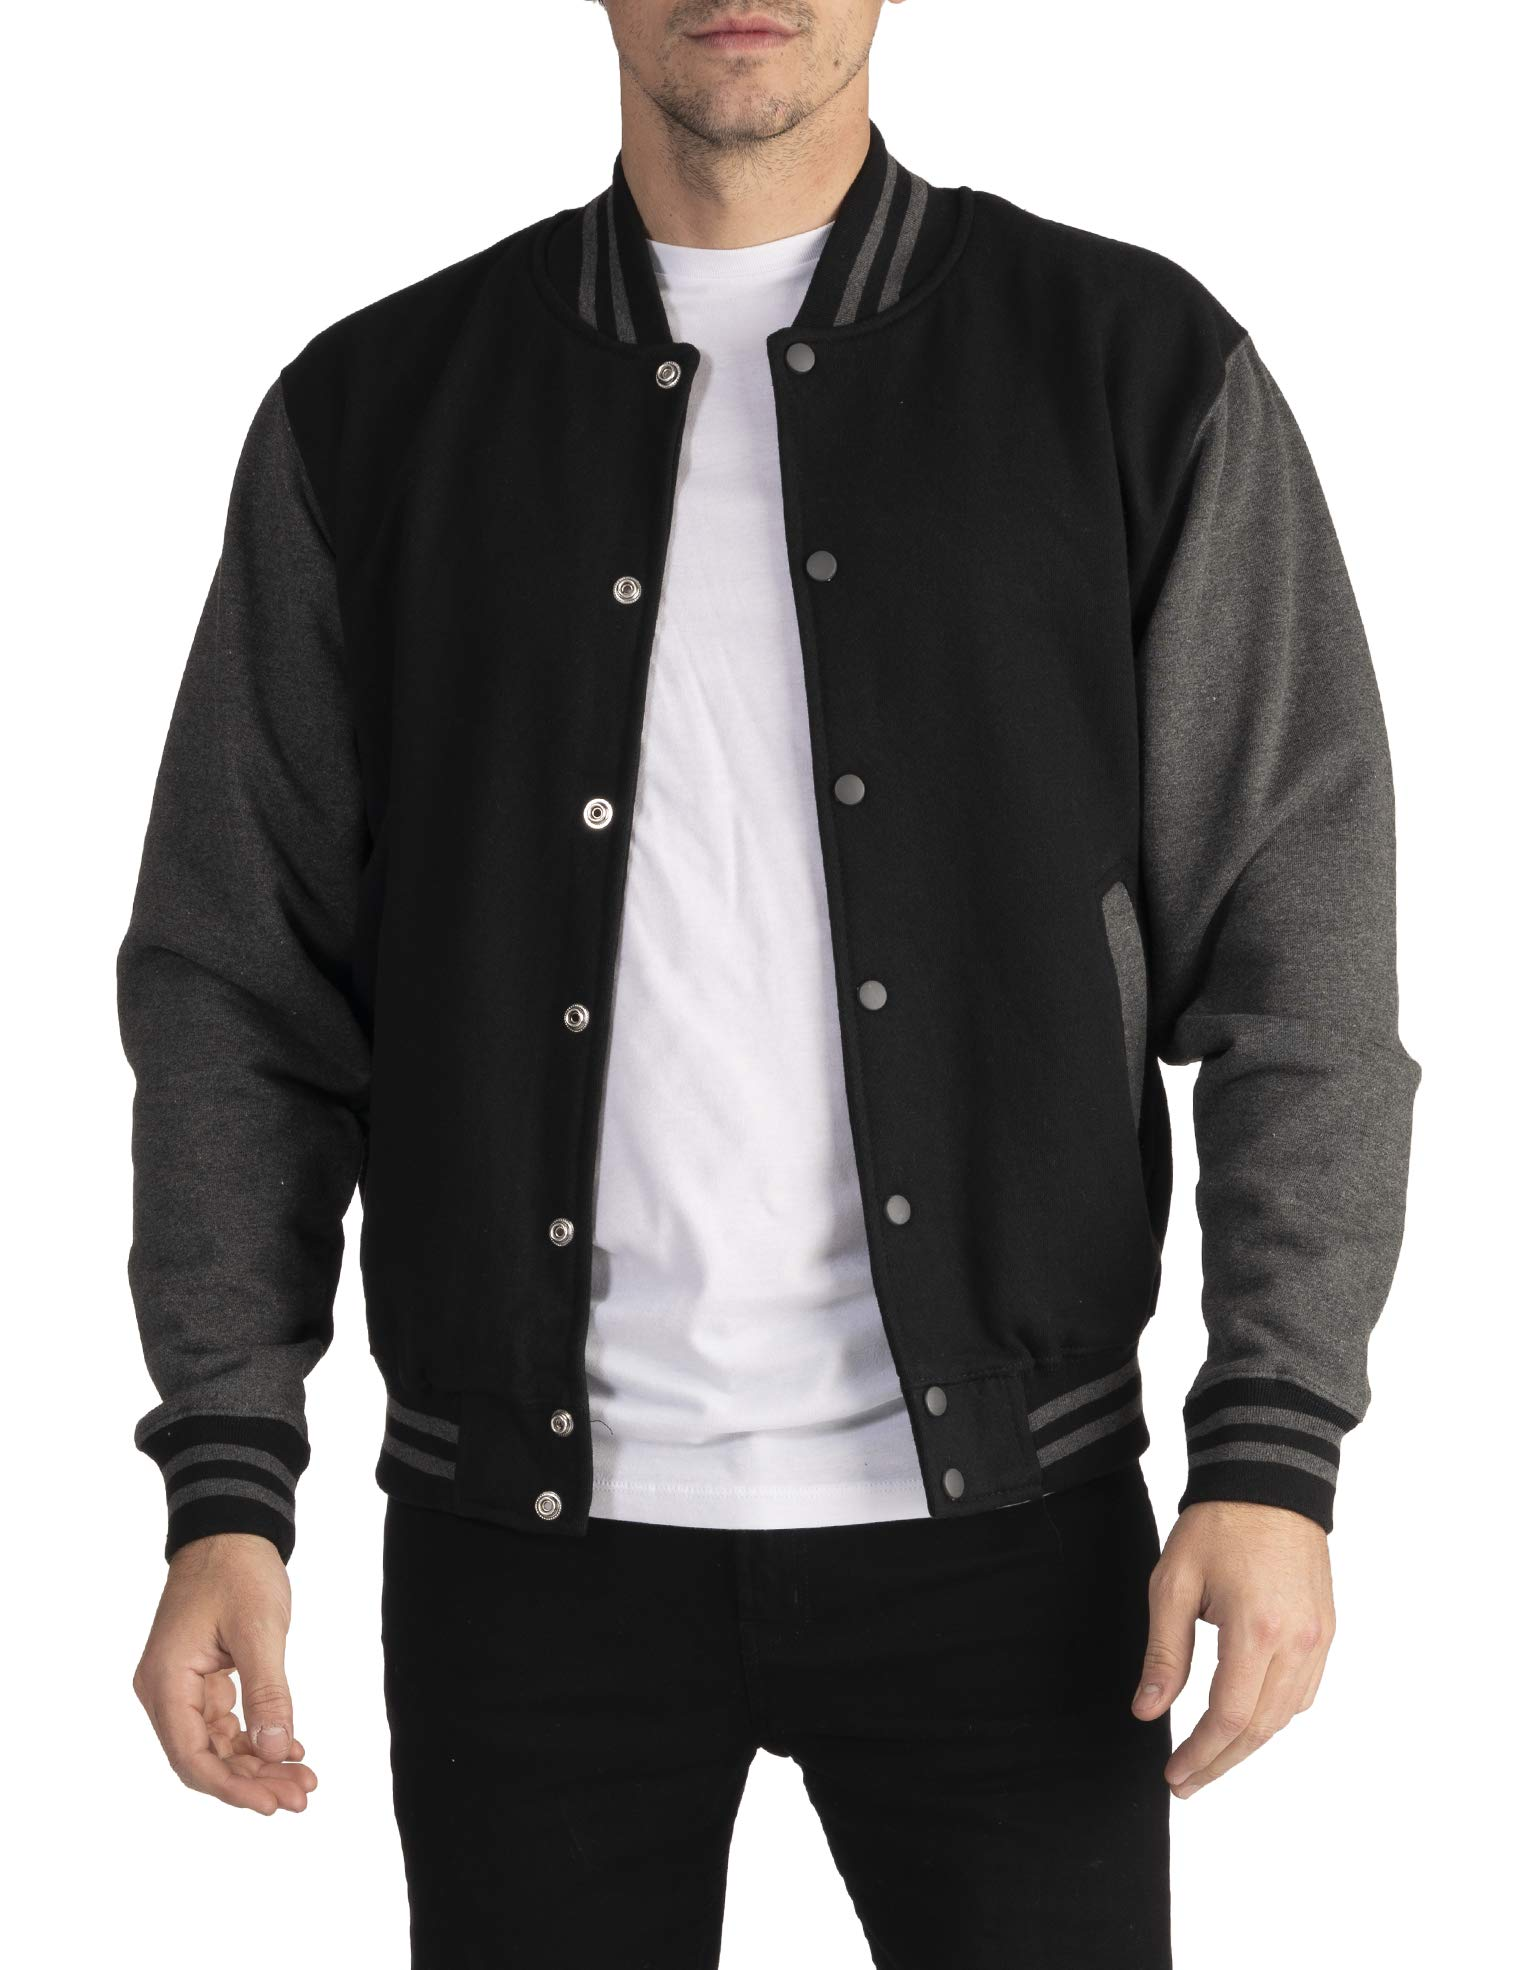 Pro Club Men's Varsity Fleece Baseball Jacket, Black/Charcoal, Large by Pro Club